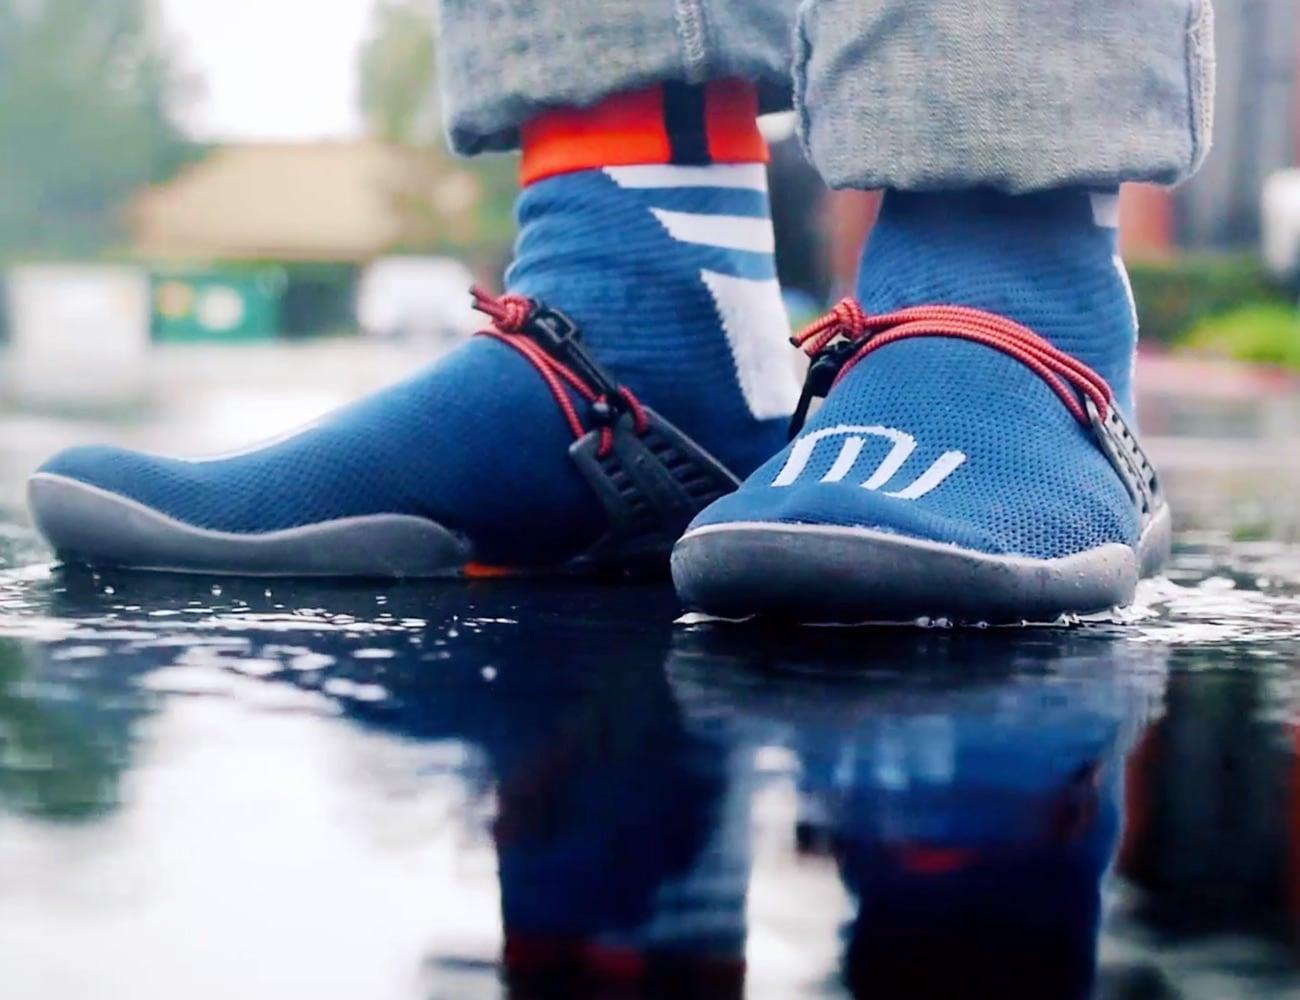 sock-like shoes are 100% waterproof